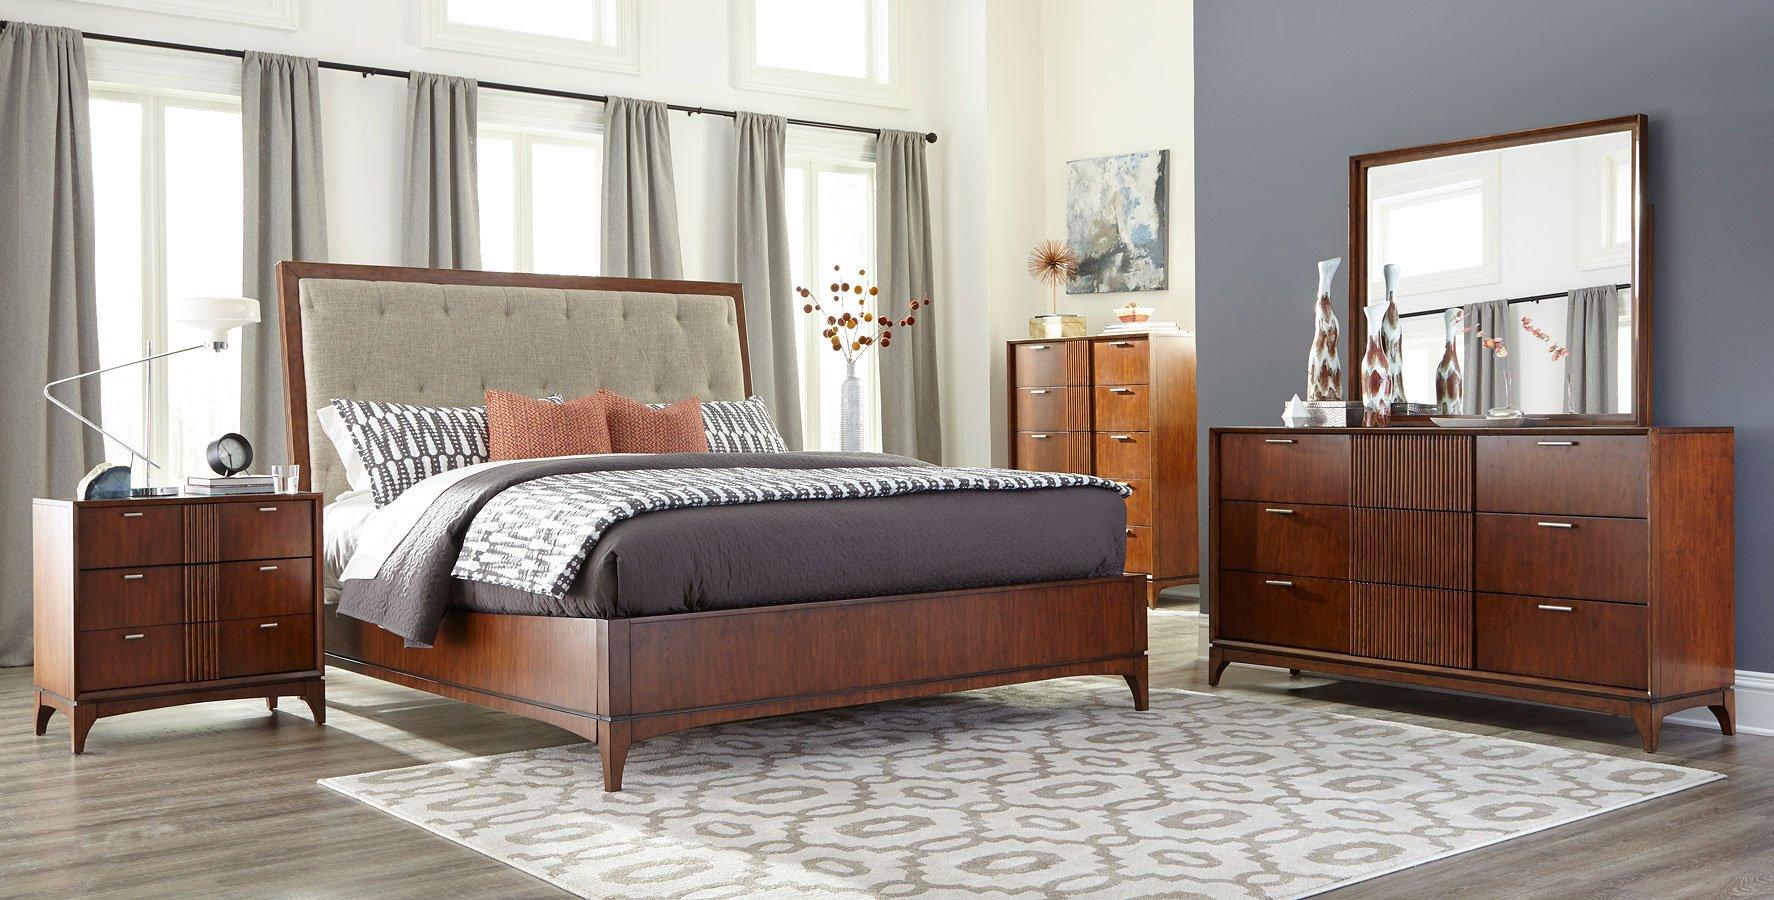 Simply Urban Park Lane Upholstered Bedroom Set Klaussner